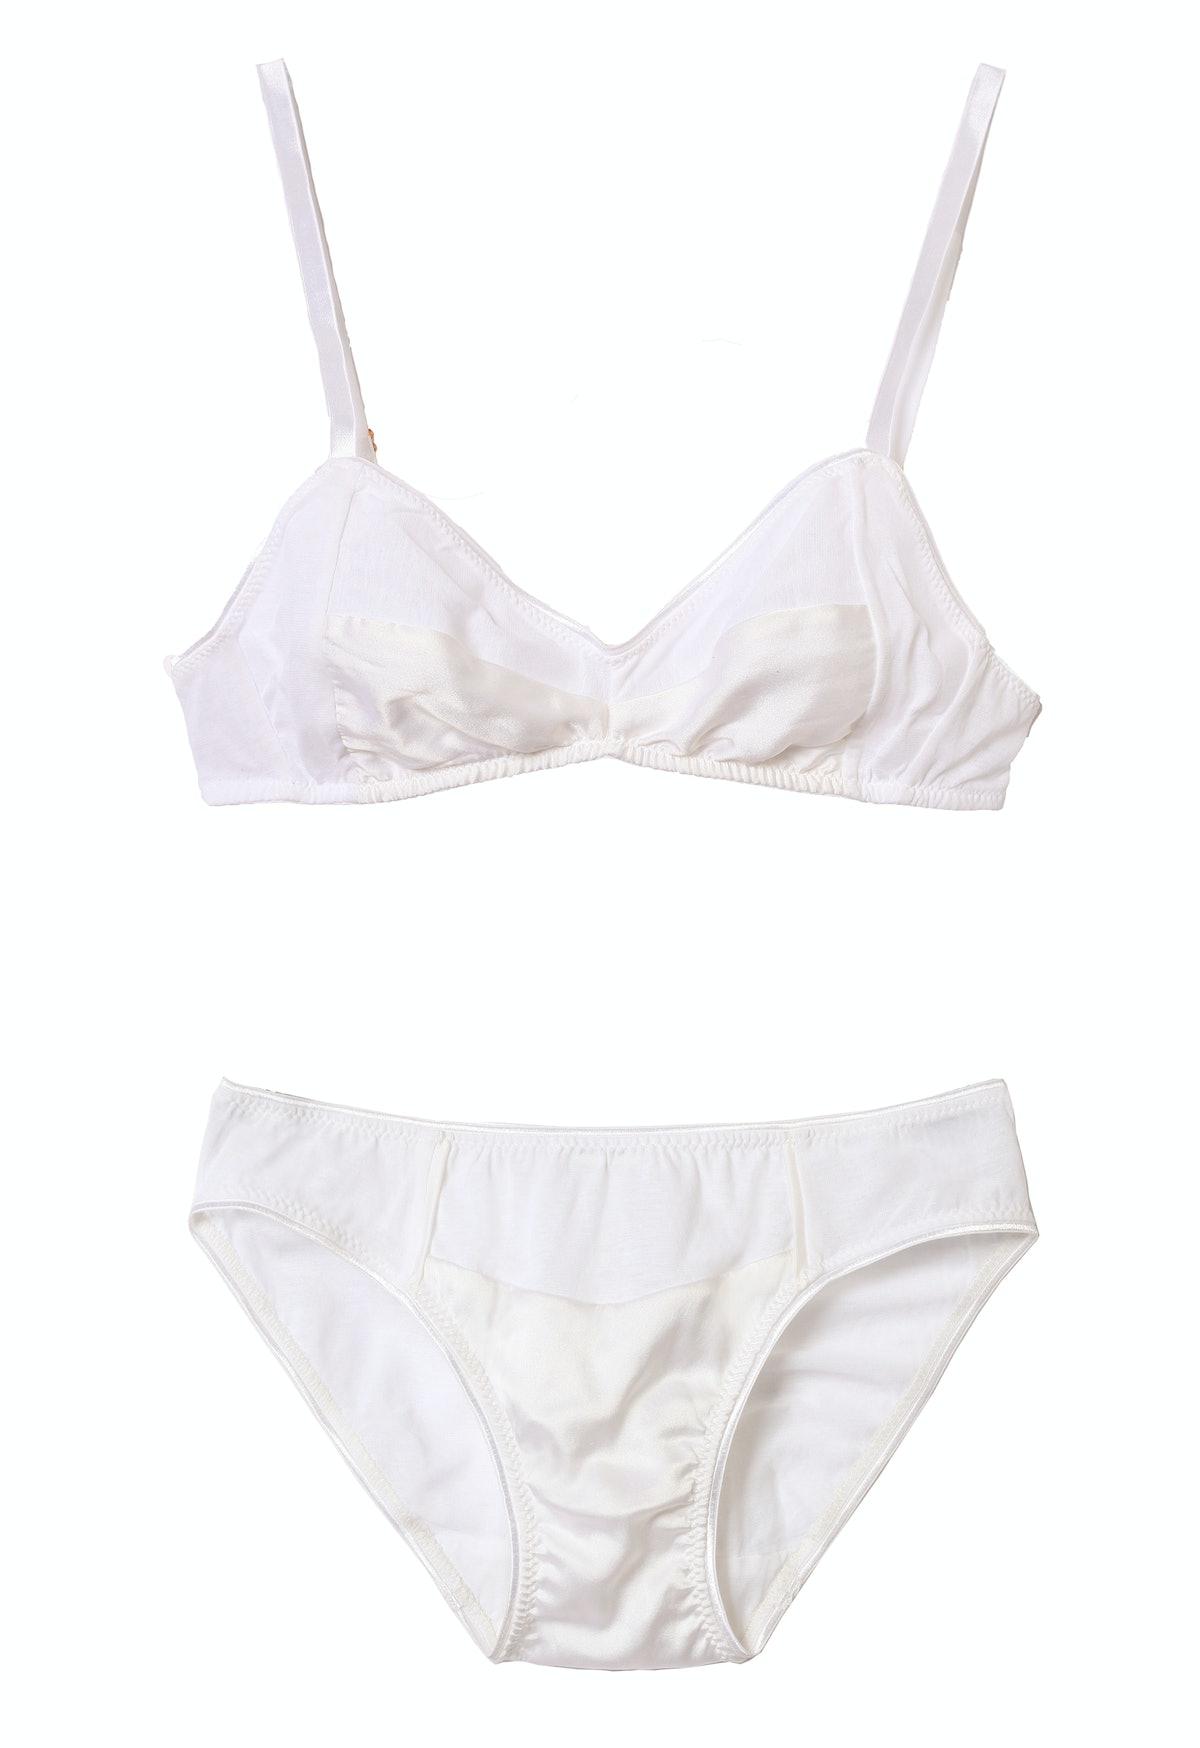 Araks bra and panty